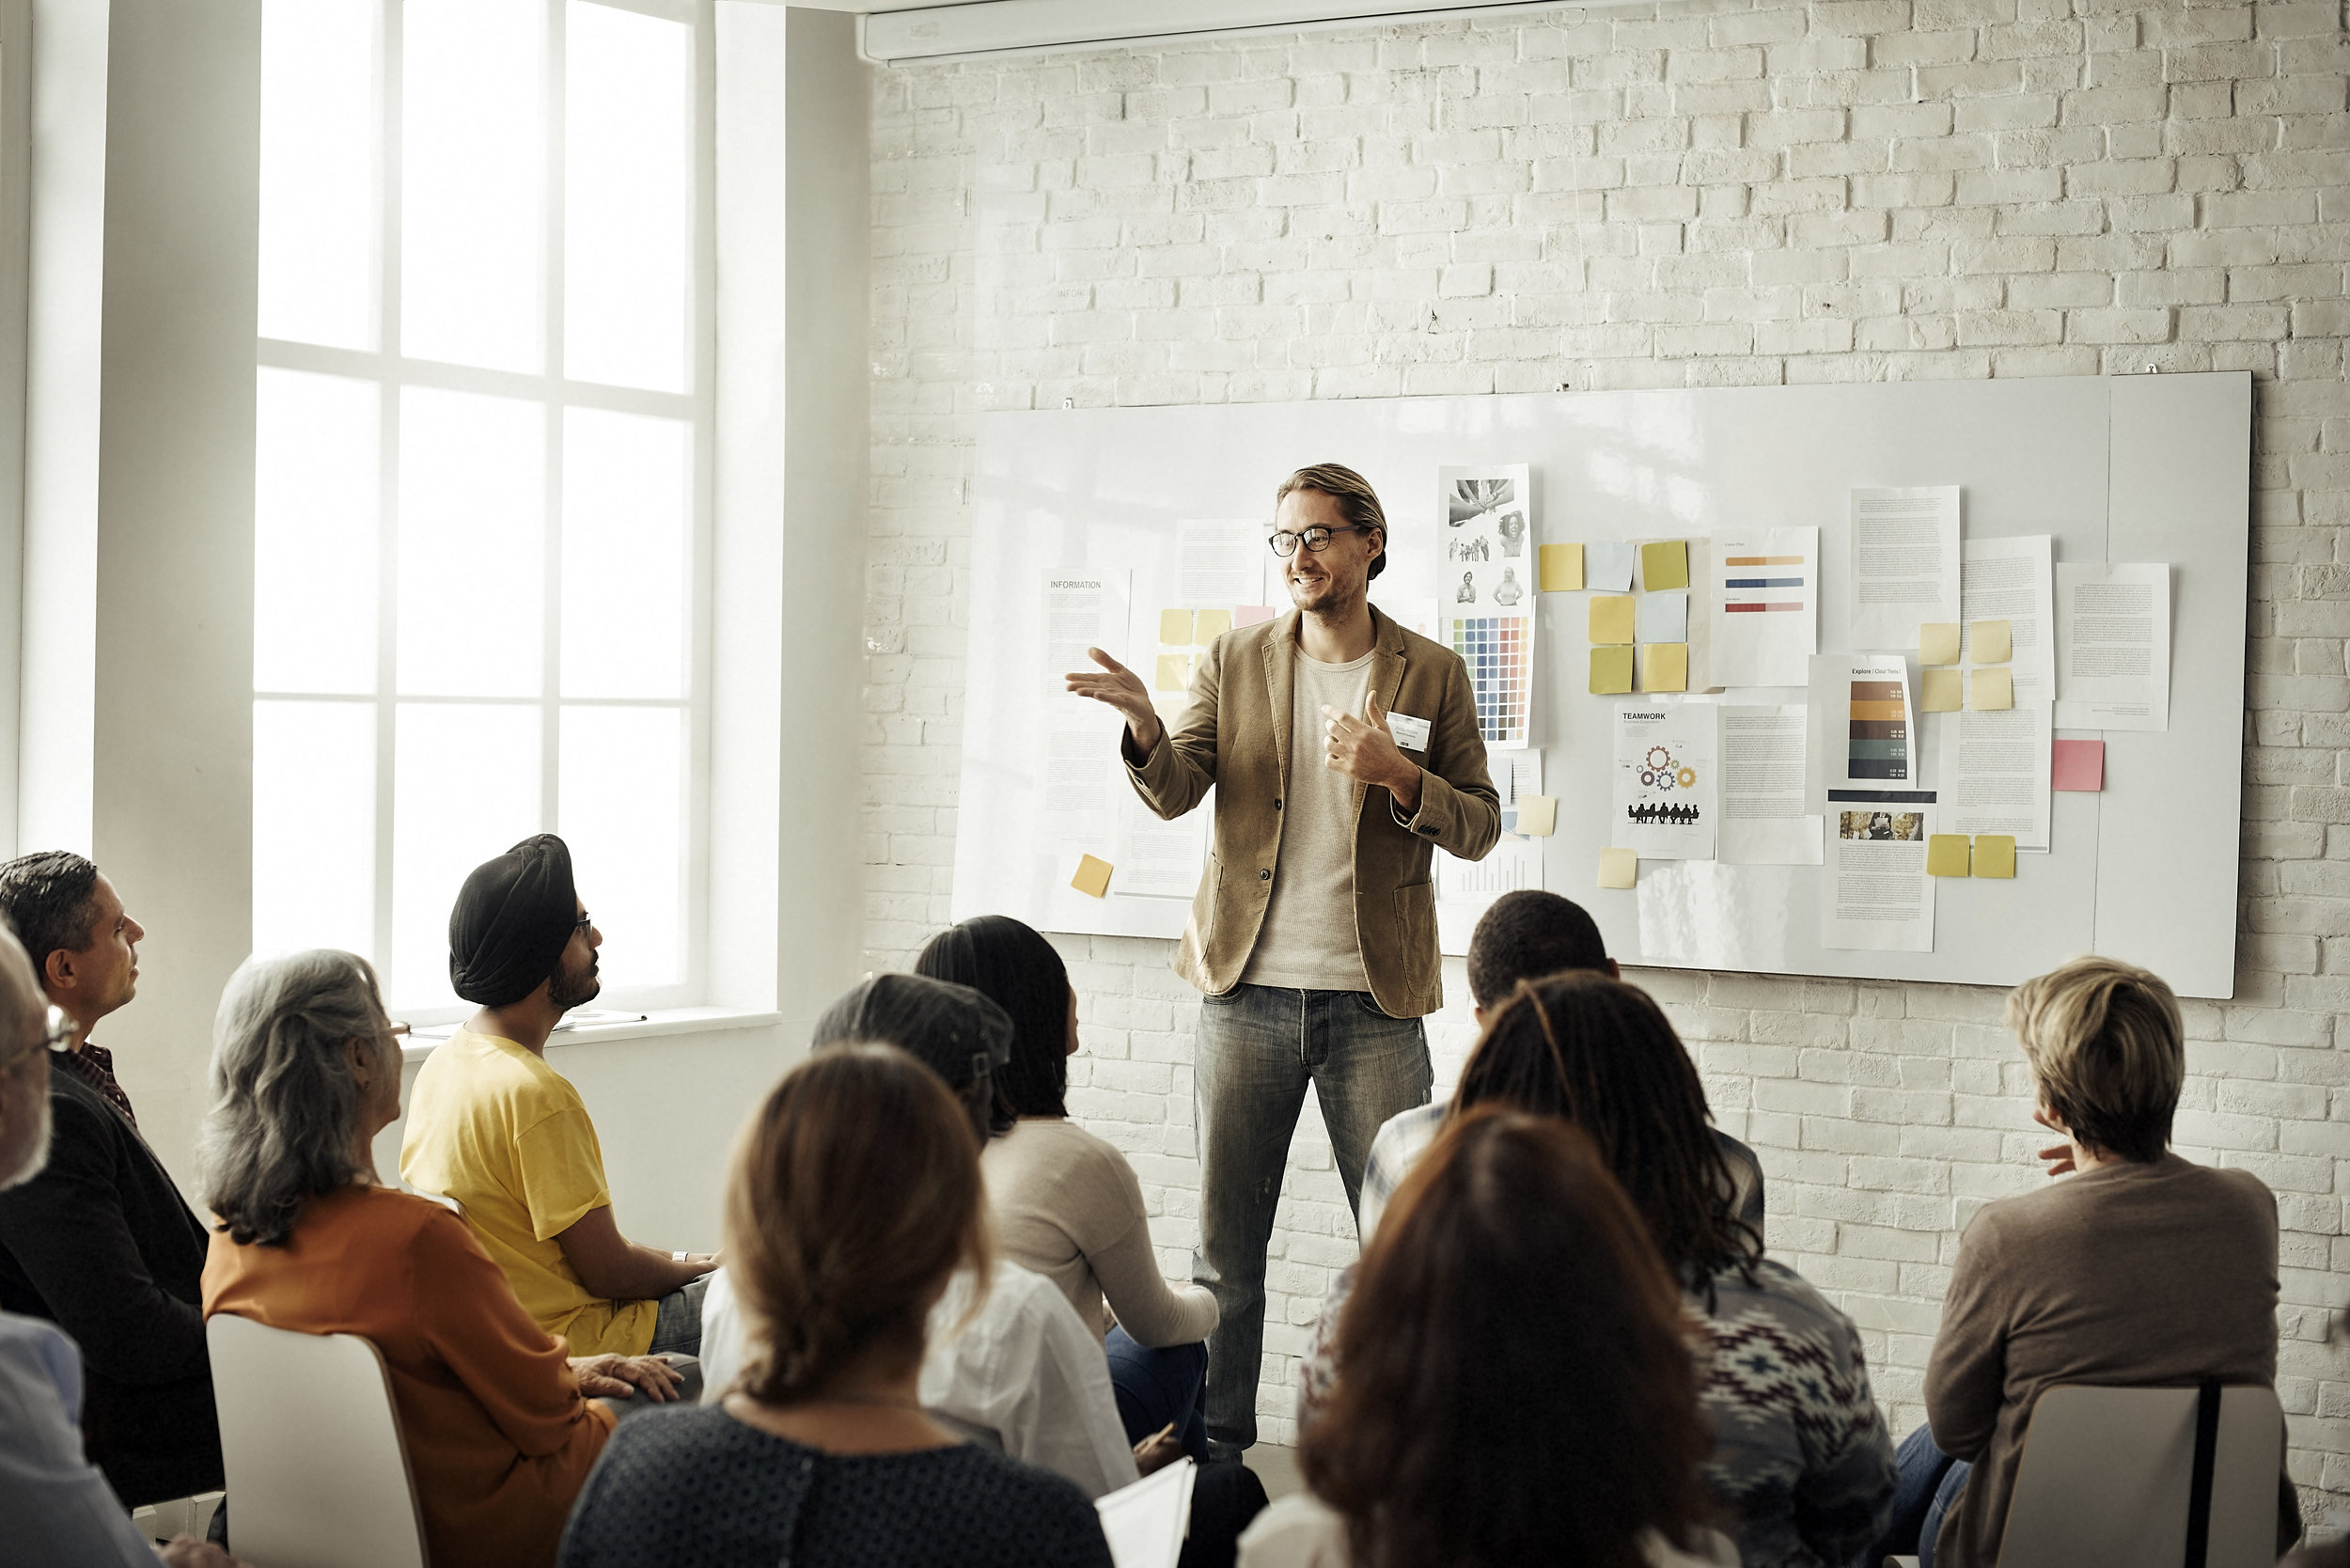 conference-office-worker-colleagues-meeting-team-PUWWAAM.jpg